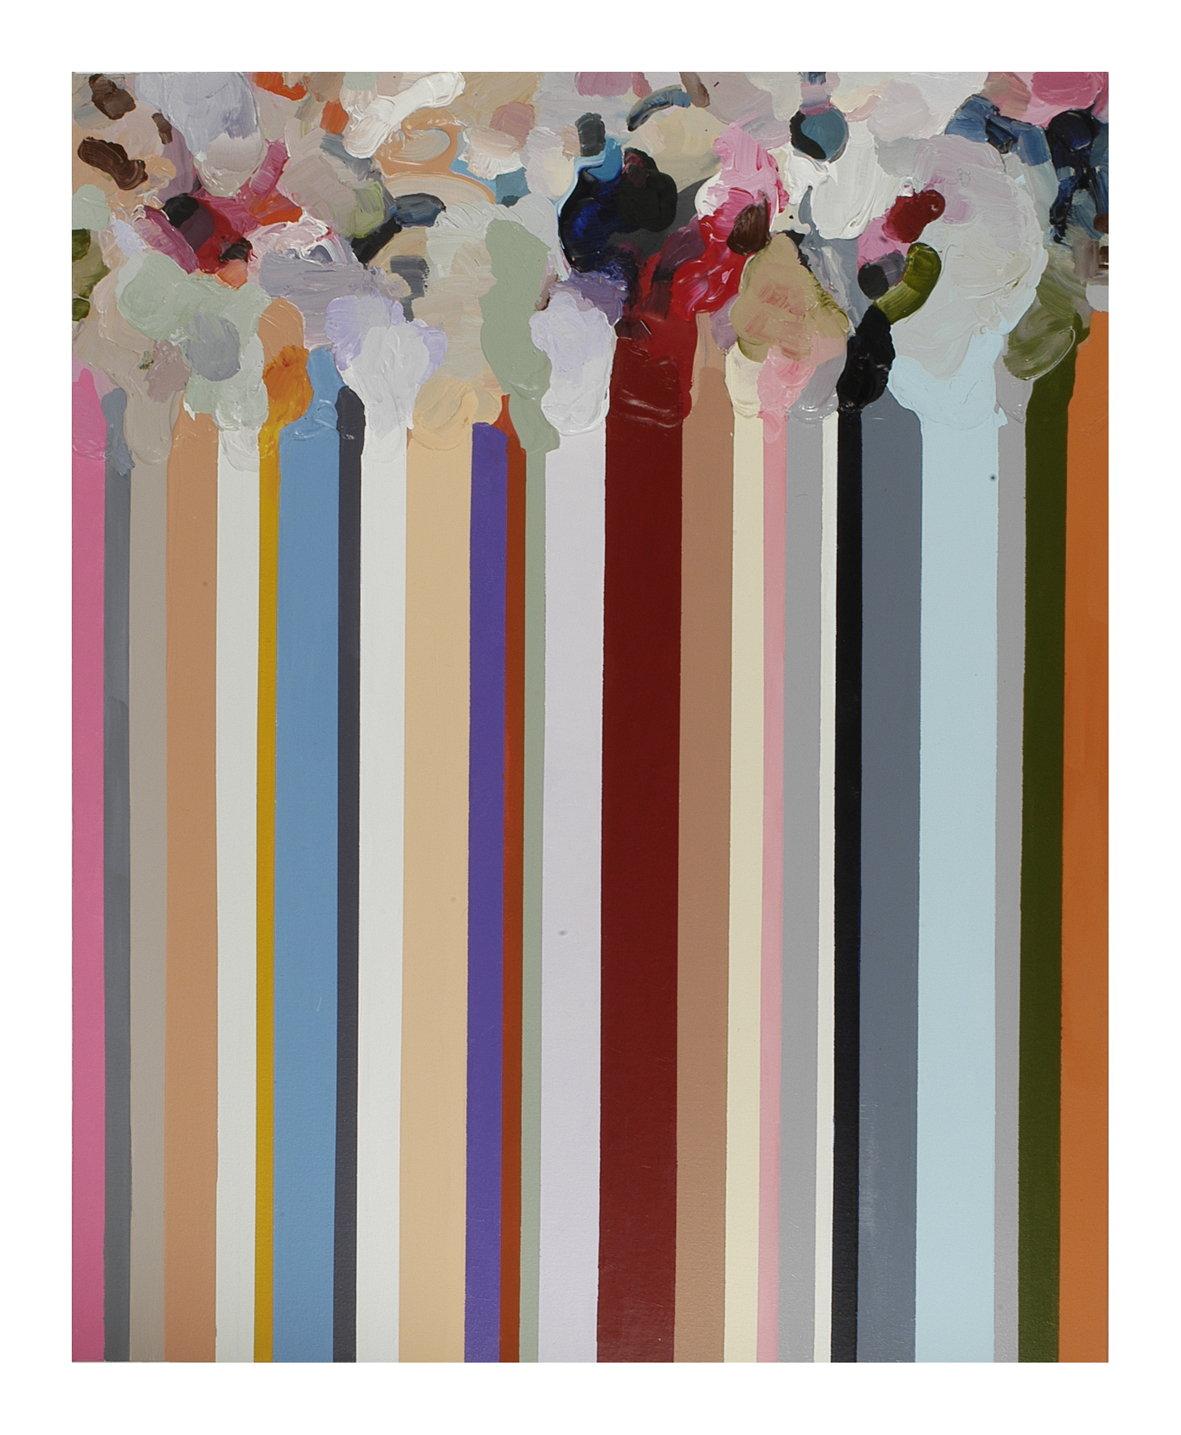 Blob'n Stripes - Robert Gligorov